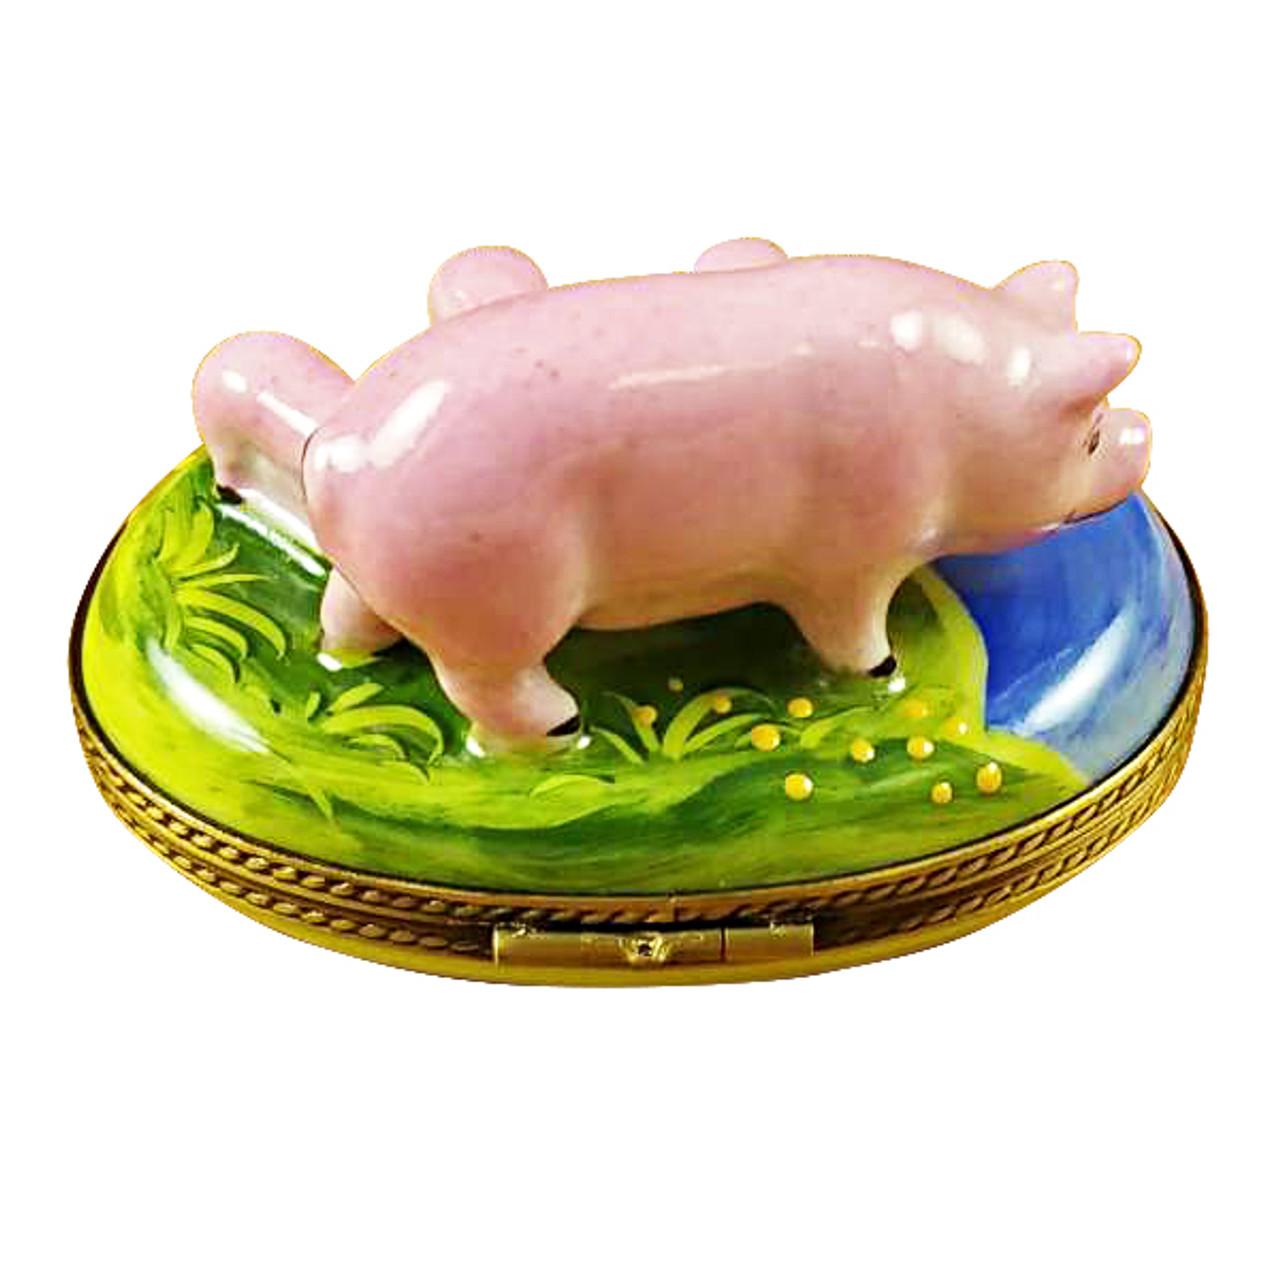 Pig With Three Babies Rochard Limoges Box